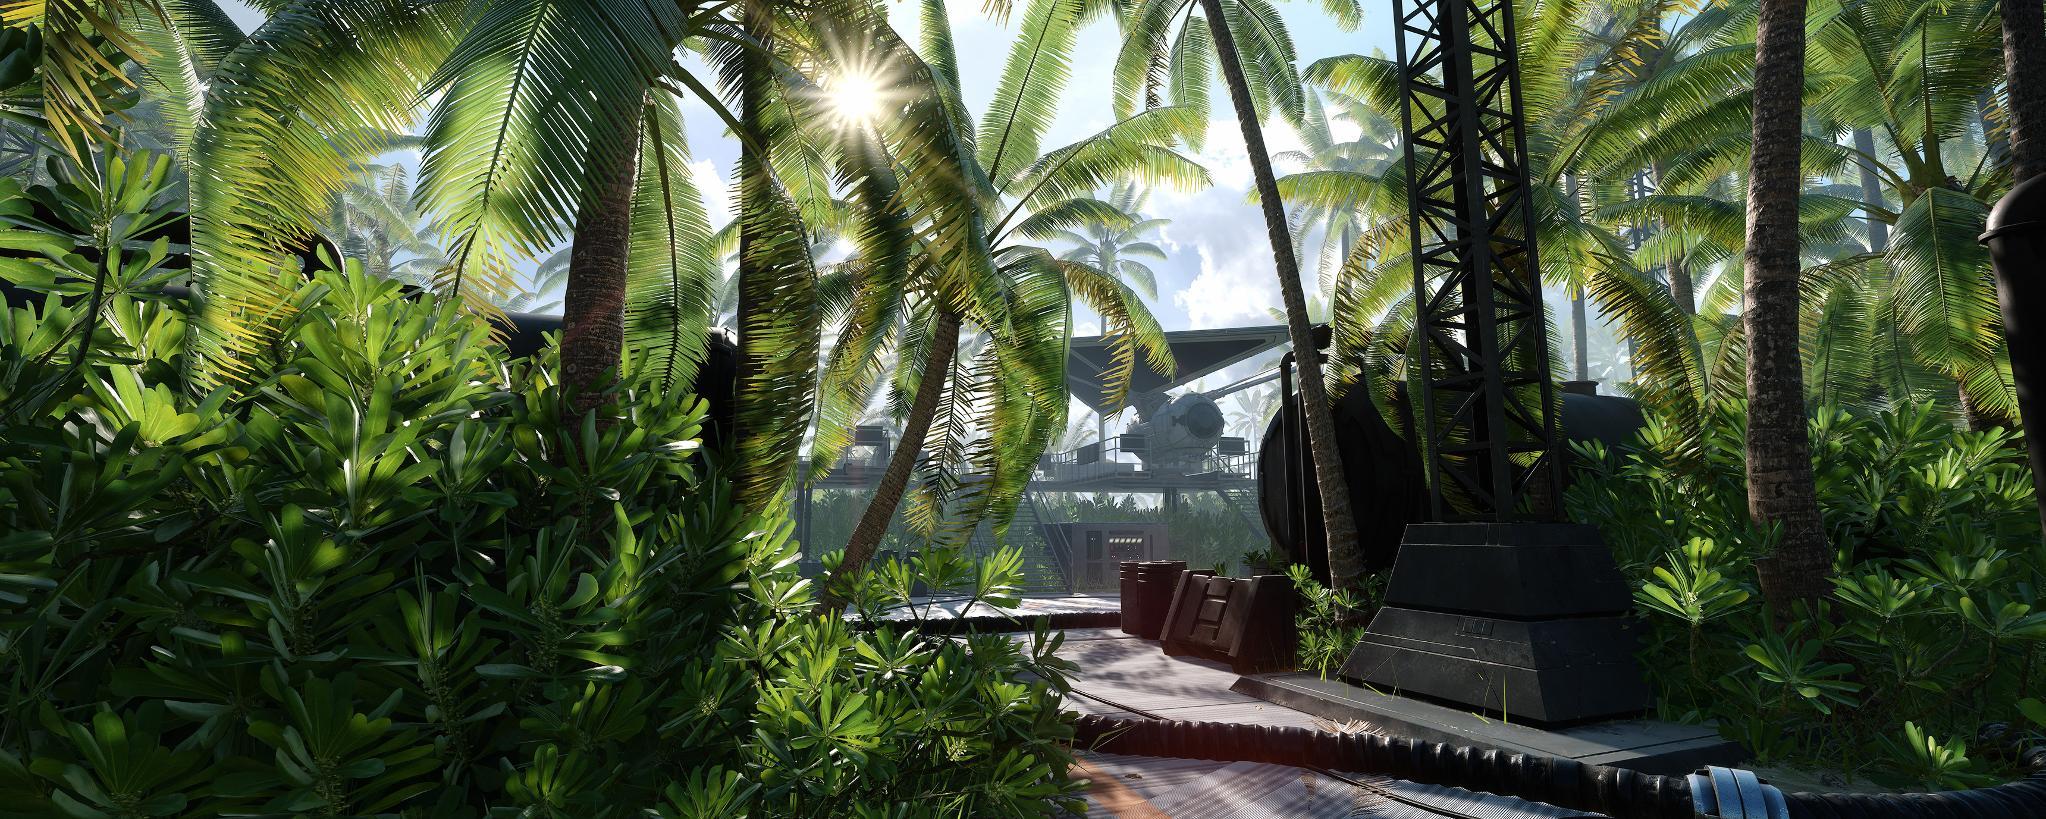 Star Wars Battlefront Rogue One: Scarif